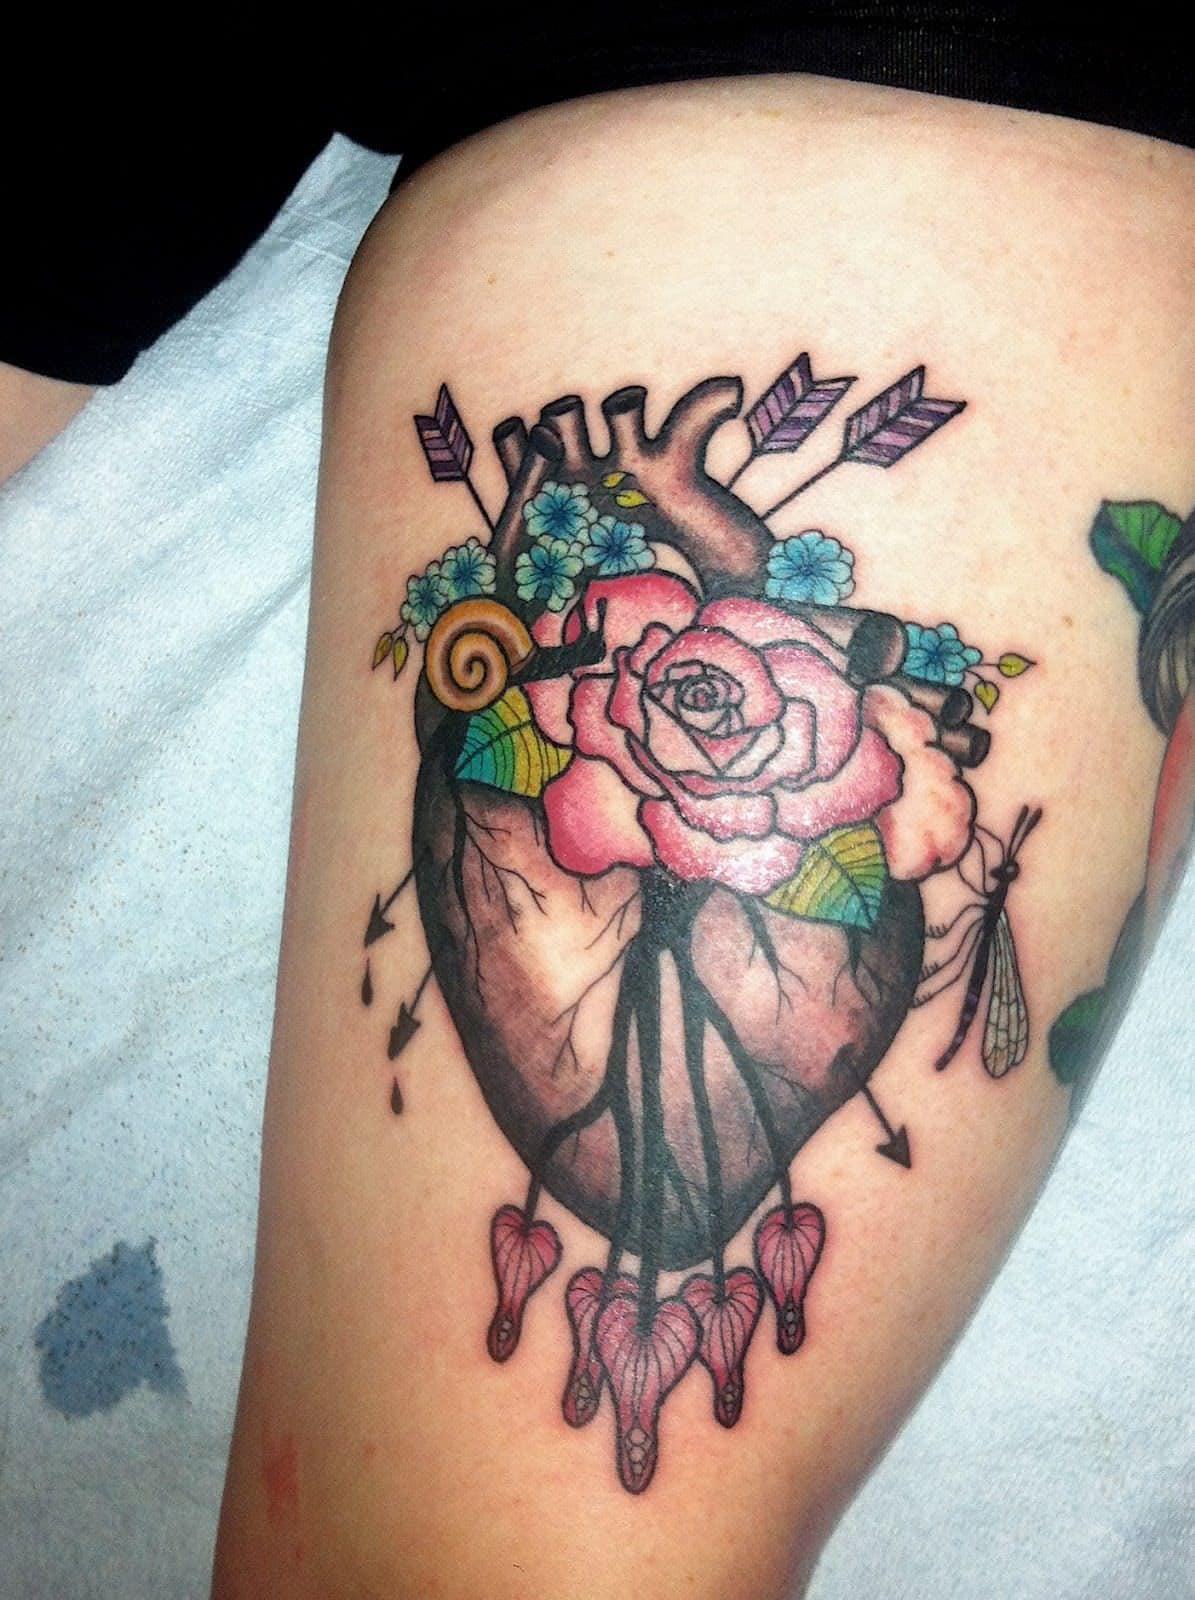 Flowered Heart Tattoo